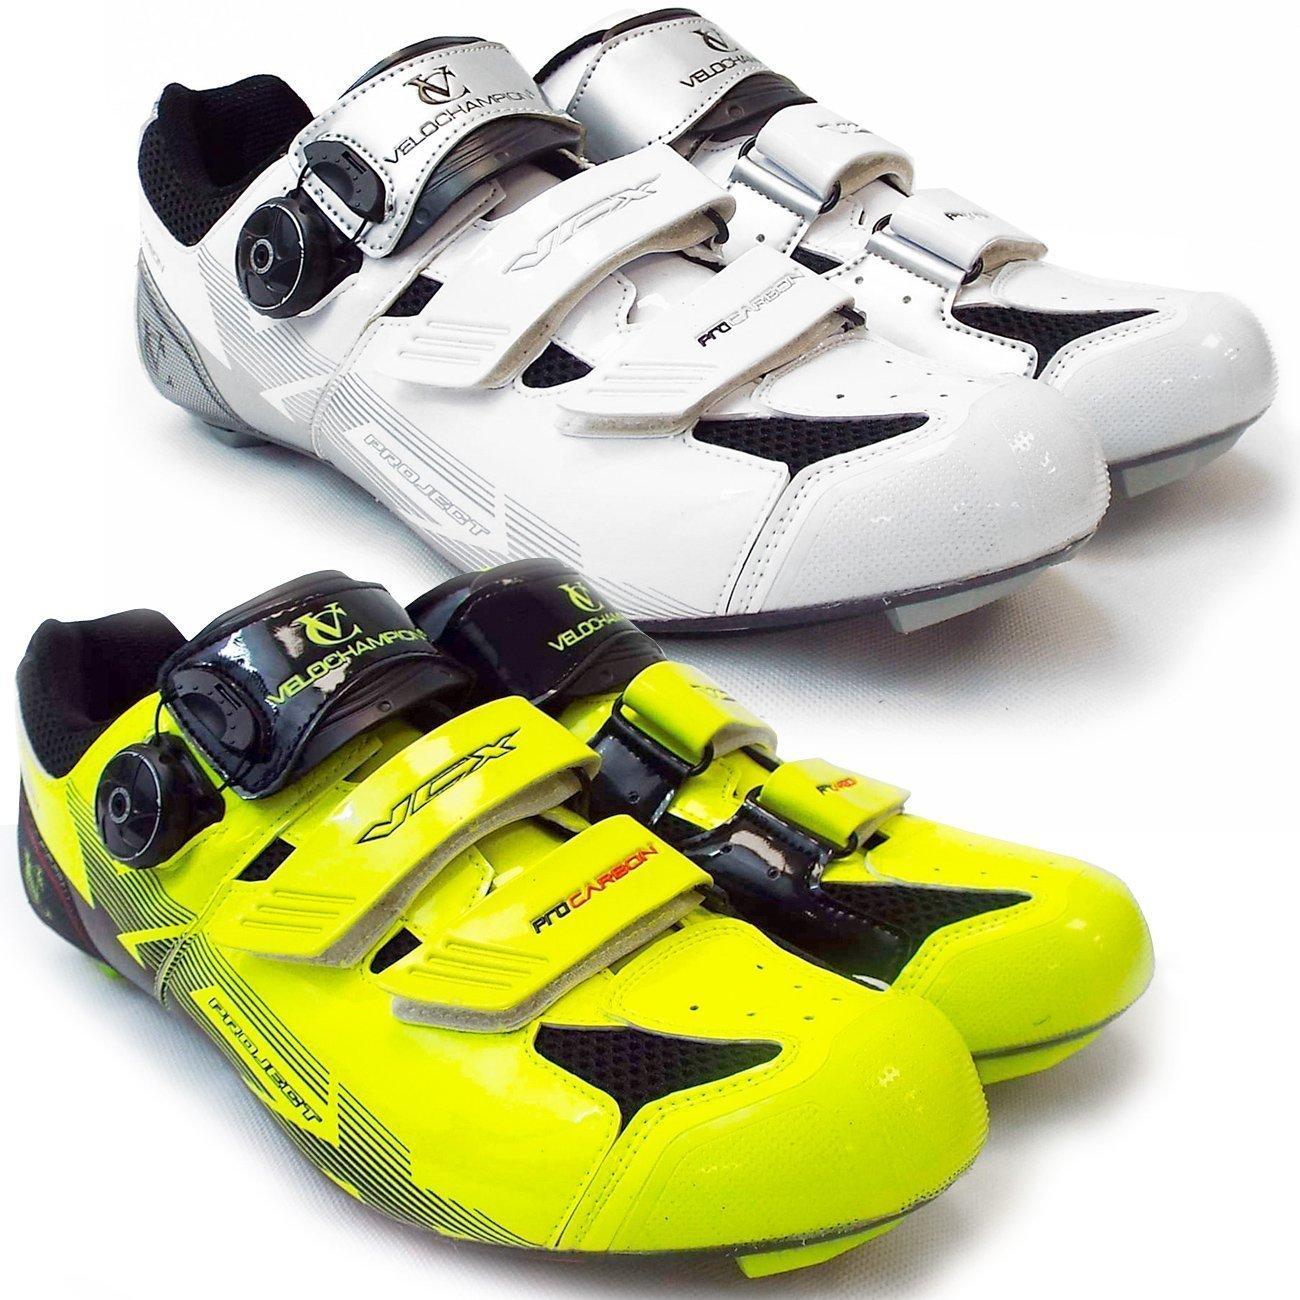 VeloChampion VCX サイクリングシューズ カーボンファイバーソール サイクリング 自転車 (ホワイトシルバーブラック, 43)   B015RK19LQ